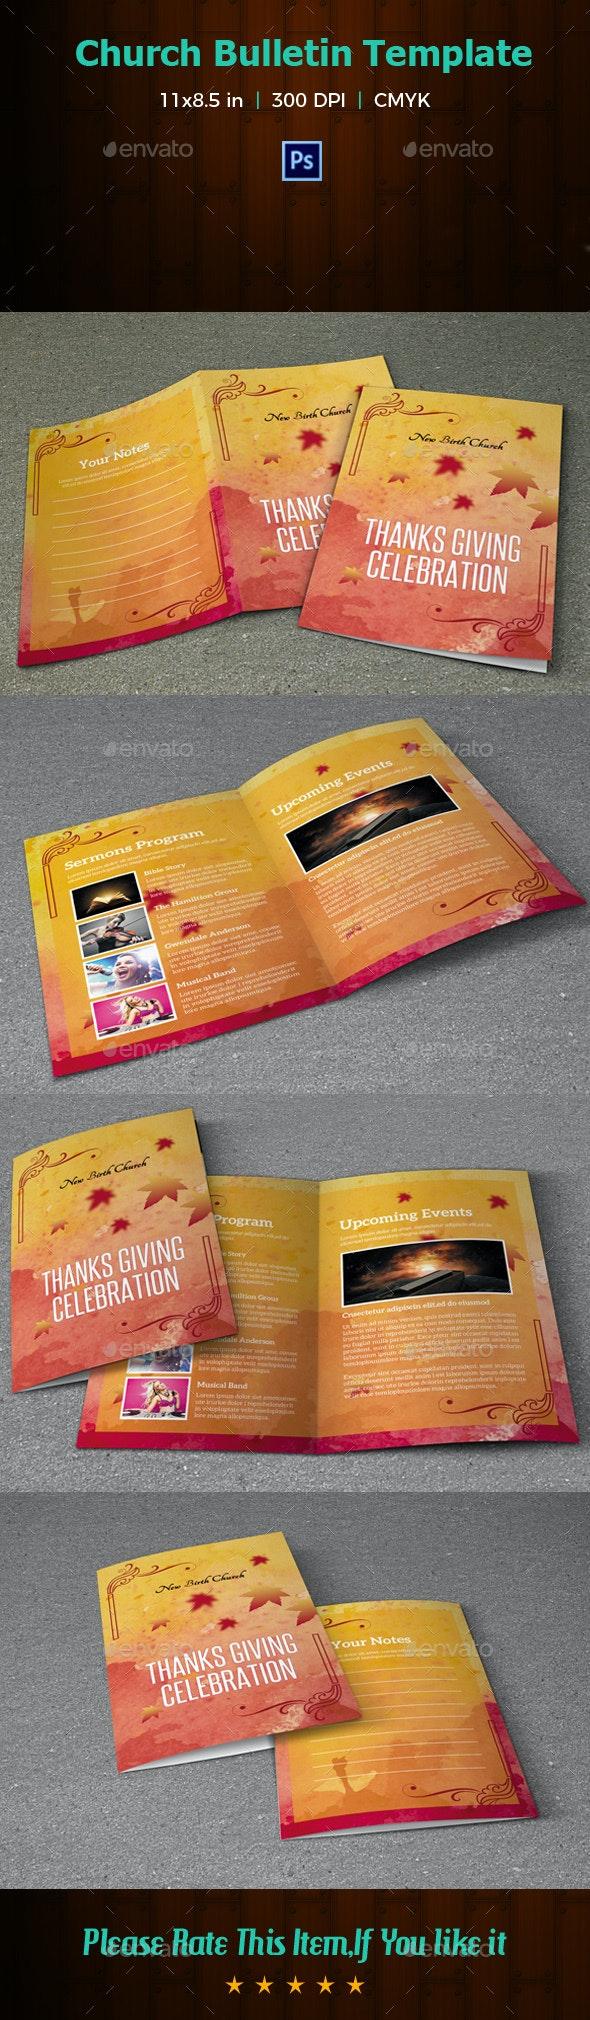 Church Bulletin Template-V04 - Informational Brochures